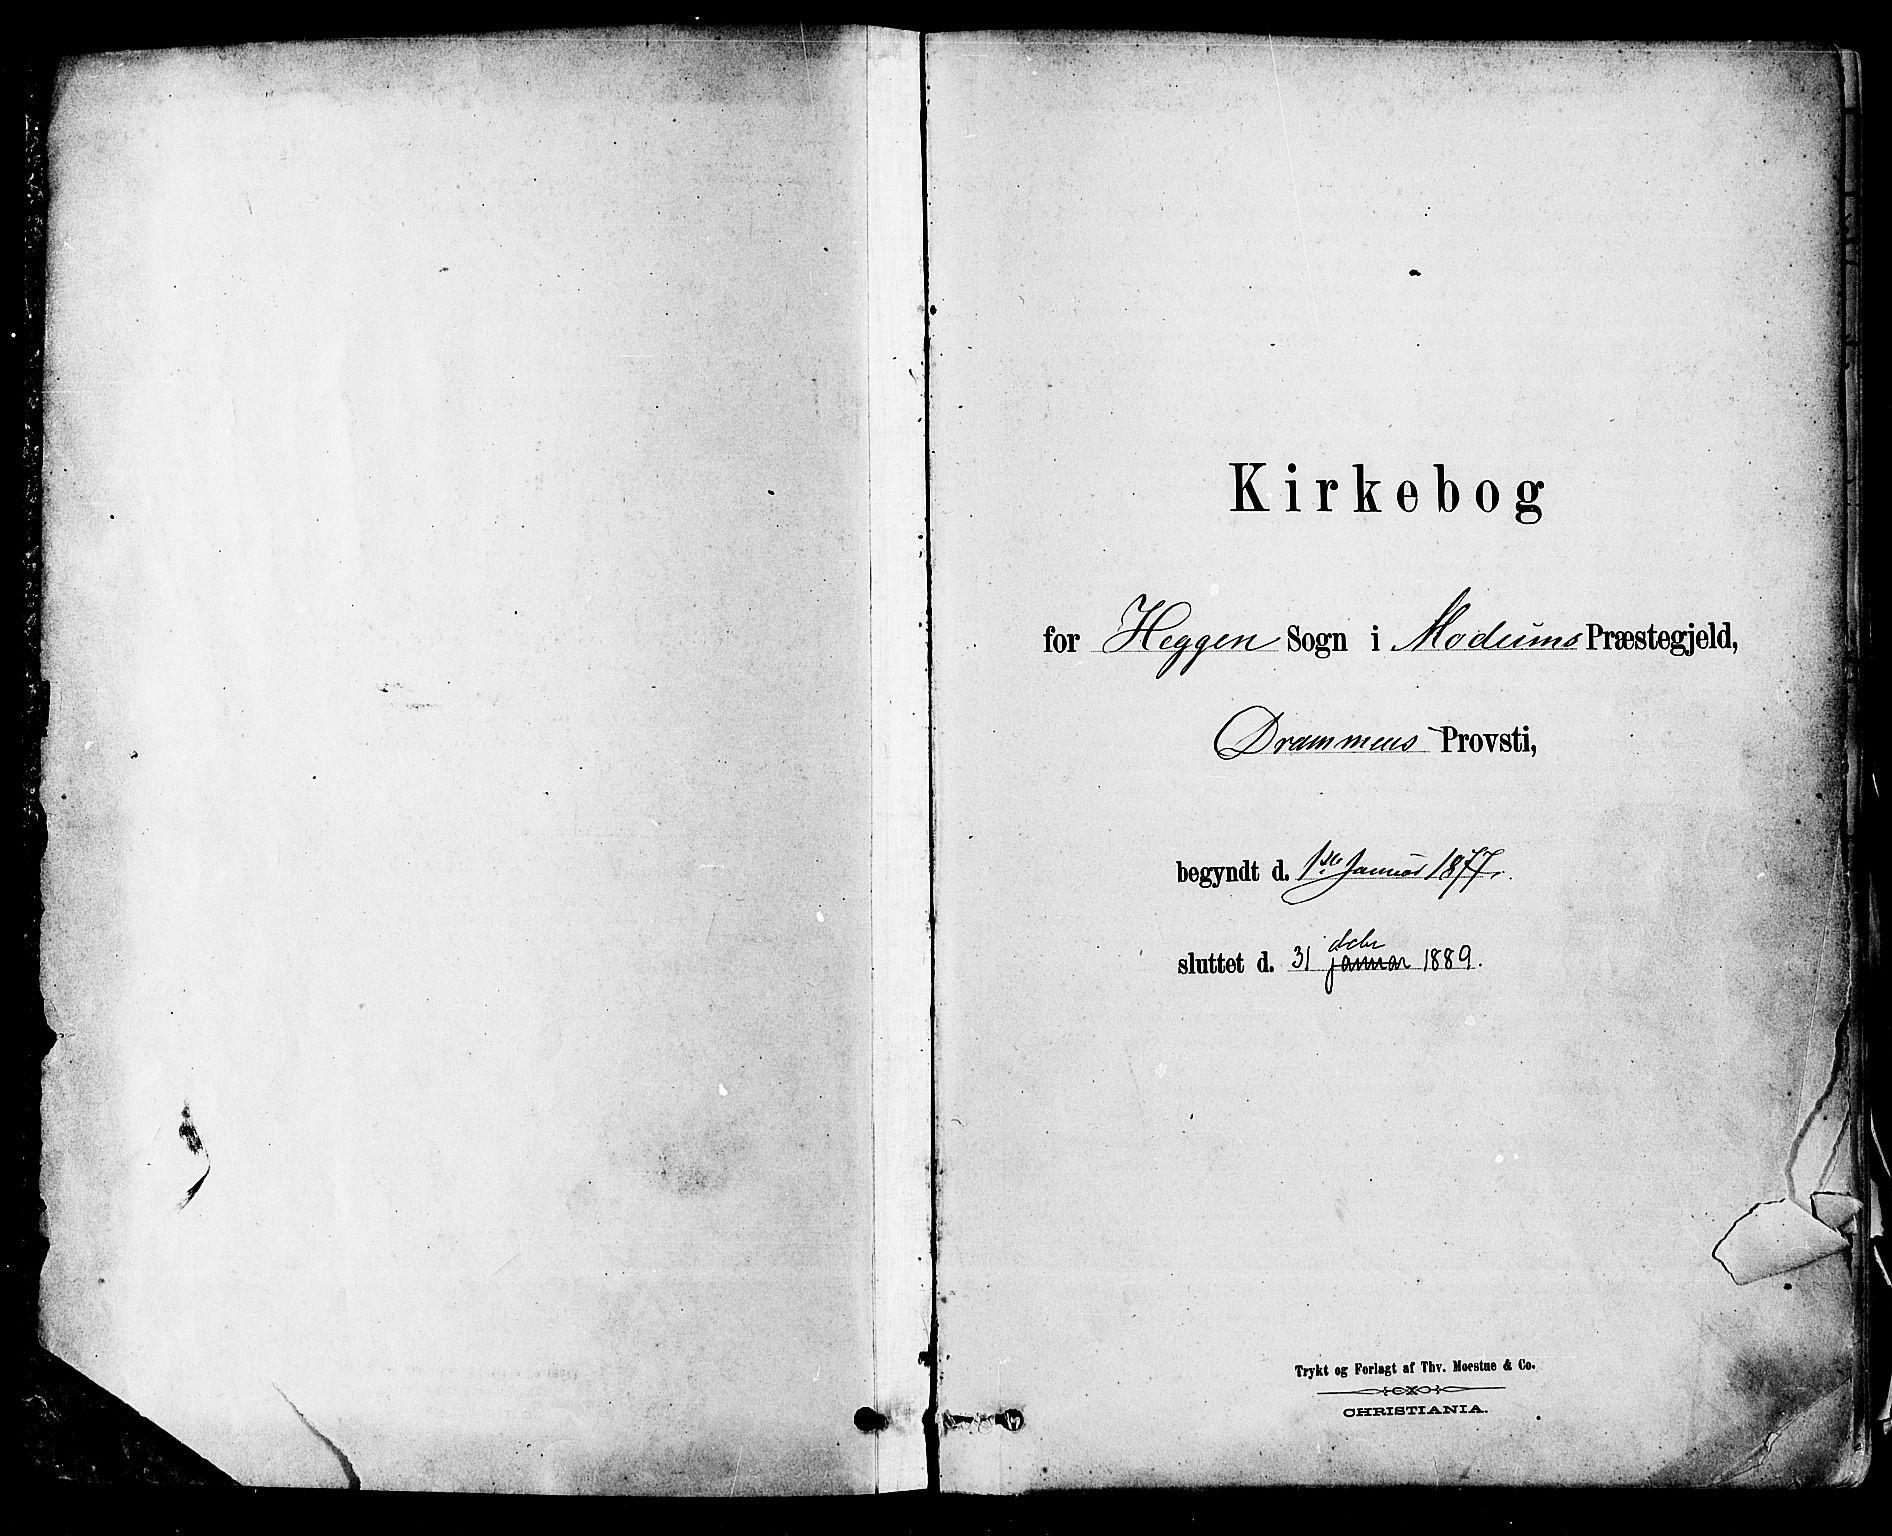 SAKO, Modum kirkebøker, F/Fa/L0011: Ministerialbok nr. 11, 1877-1889